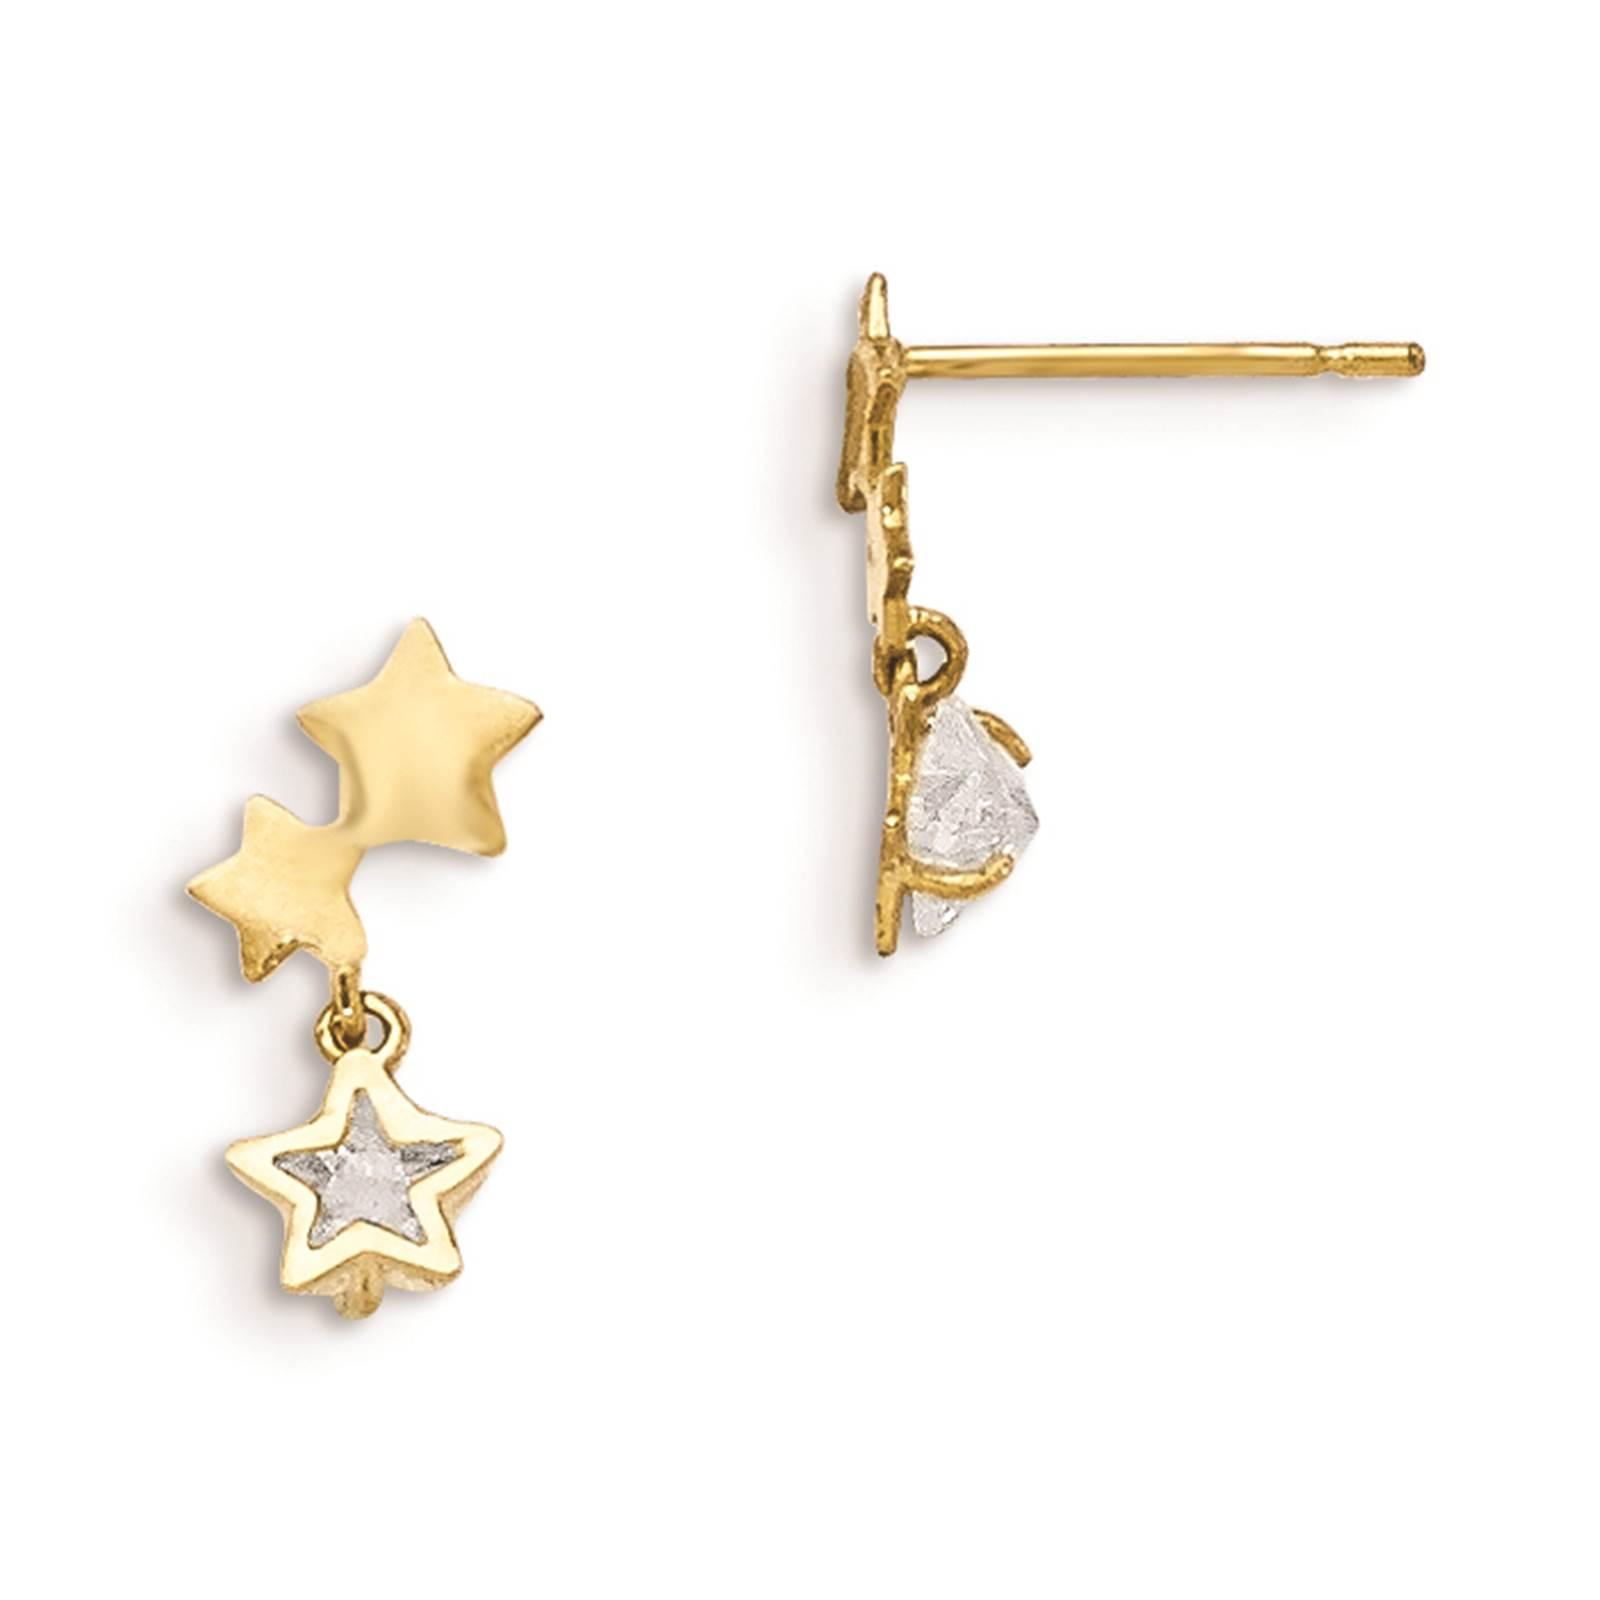 Madi K 14k Yellow Gold Children's Star Dangle Post Polished Earrings